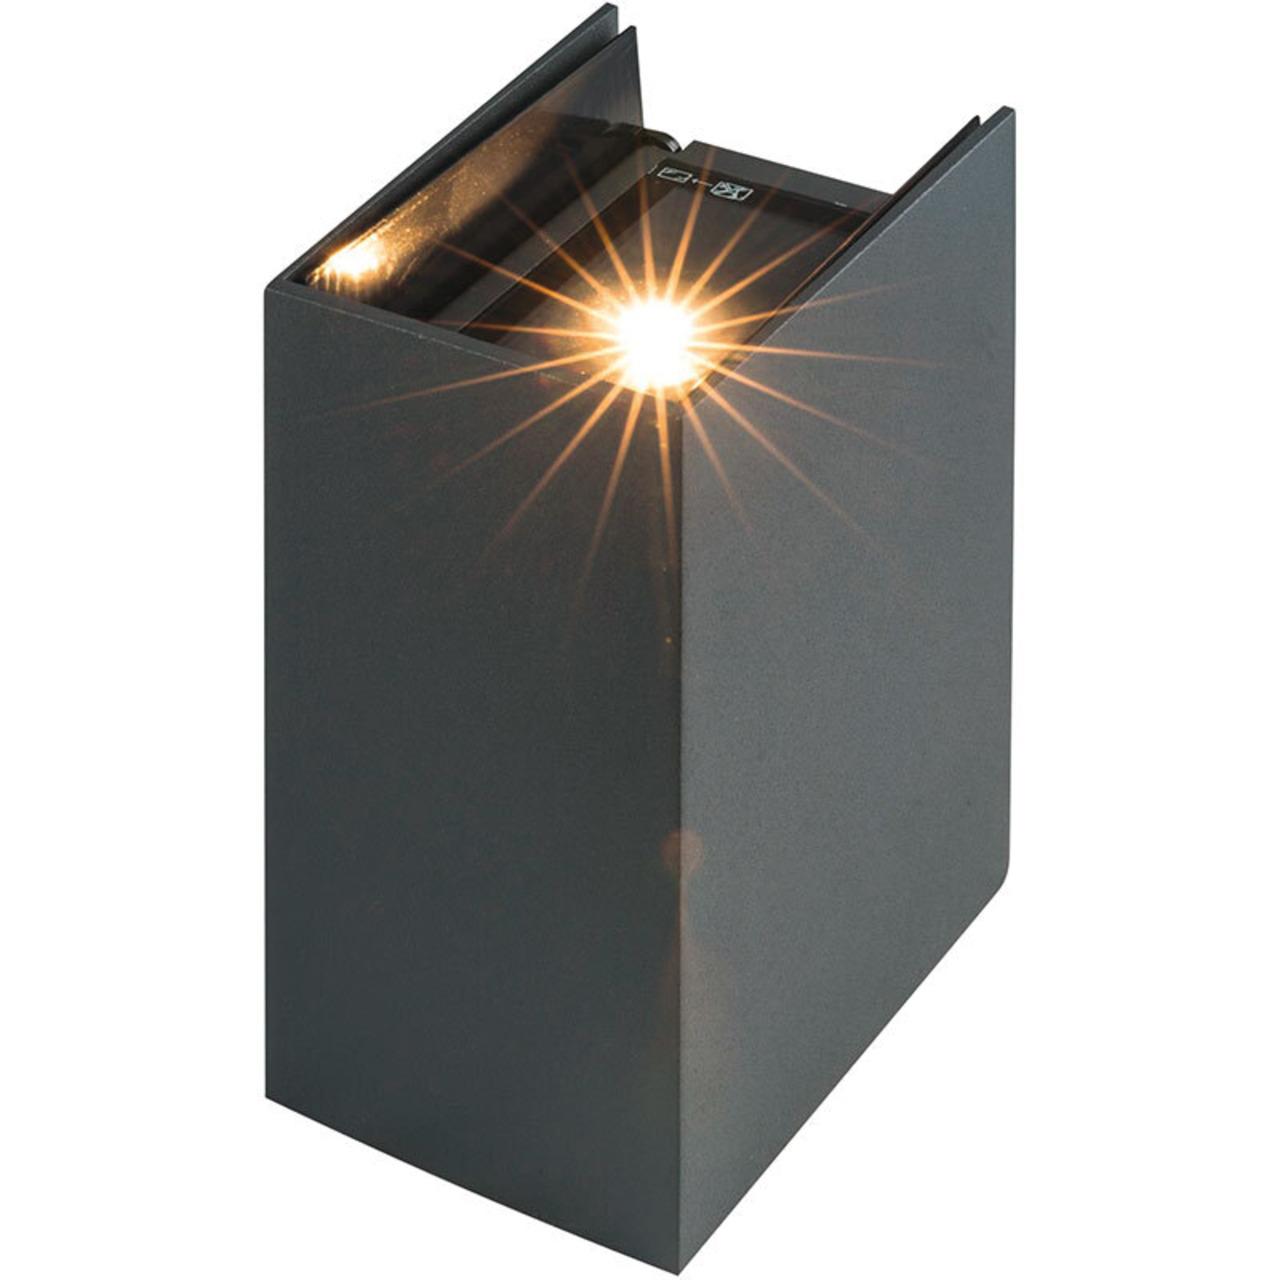 HEITRONIC 6-W-LED-Wandleuchte TILO mit einstellbarem Abstrahlwinkel- warmweiss- IP54